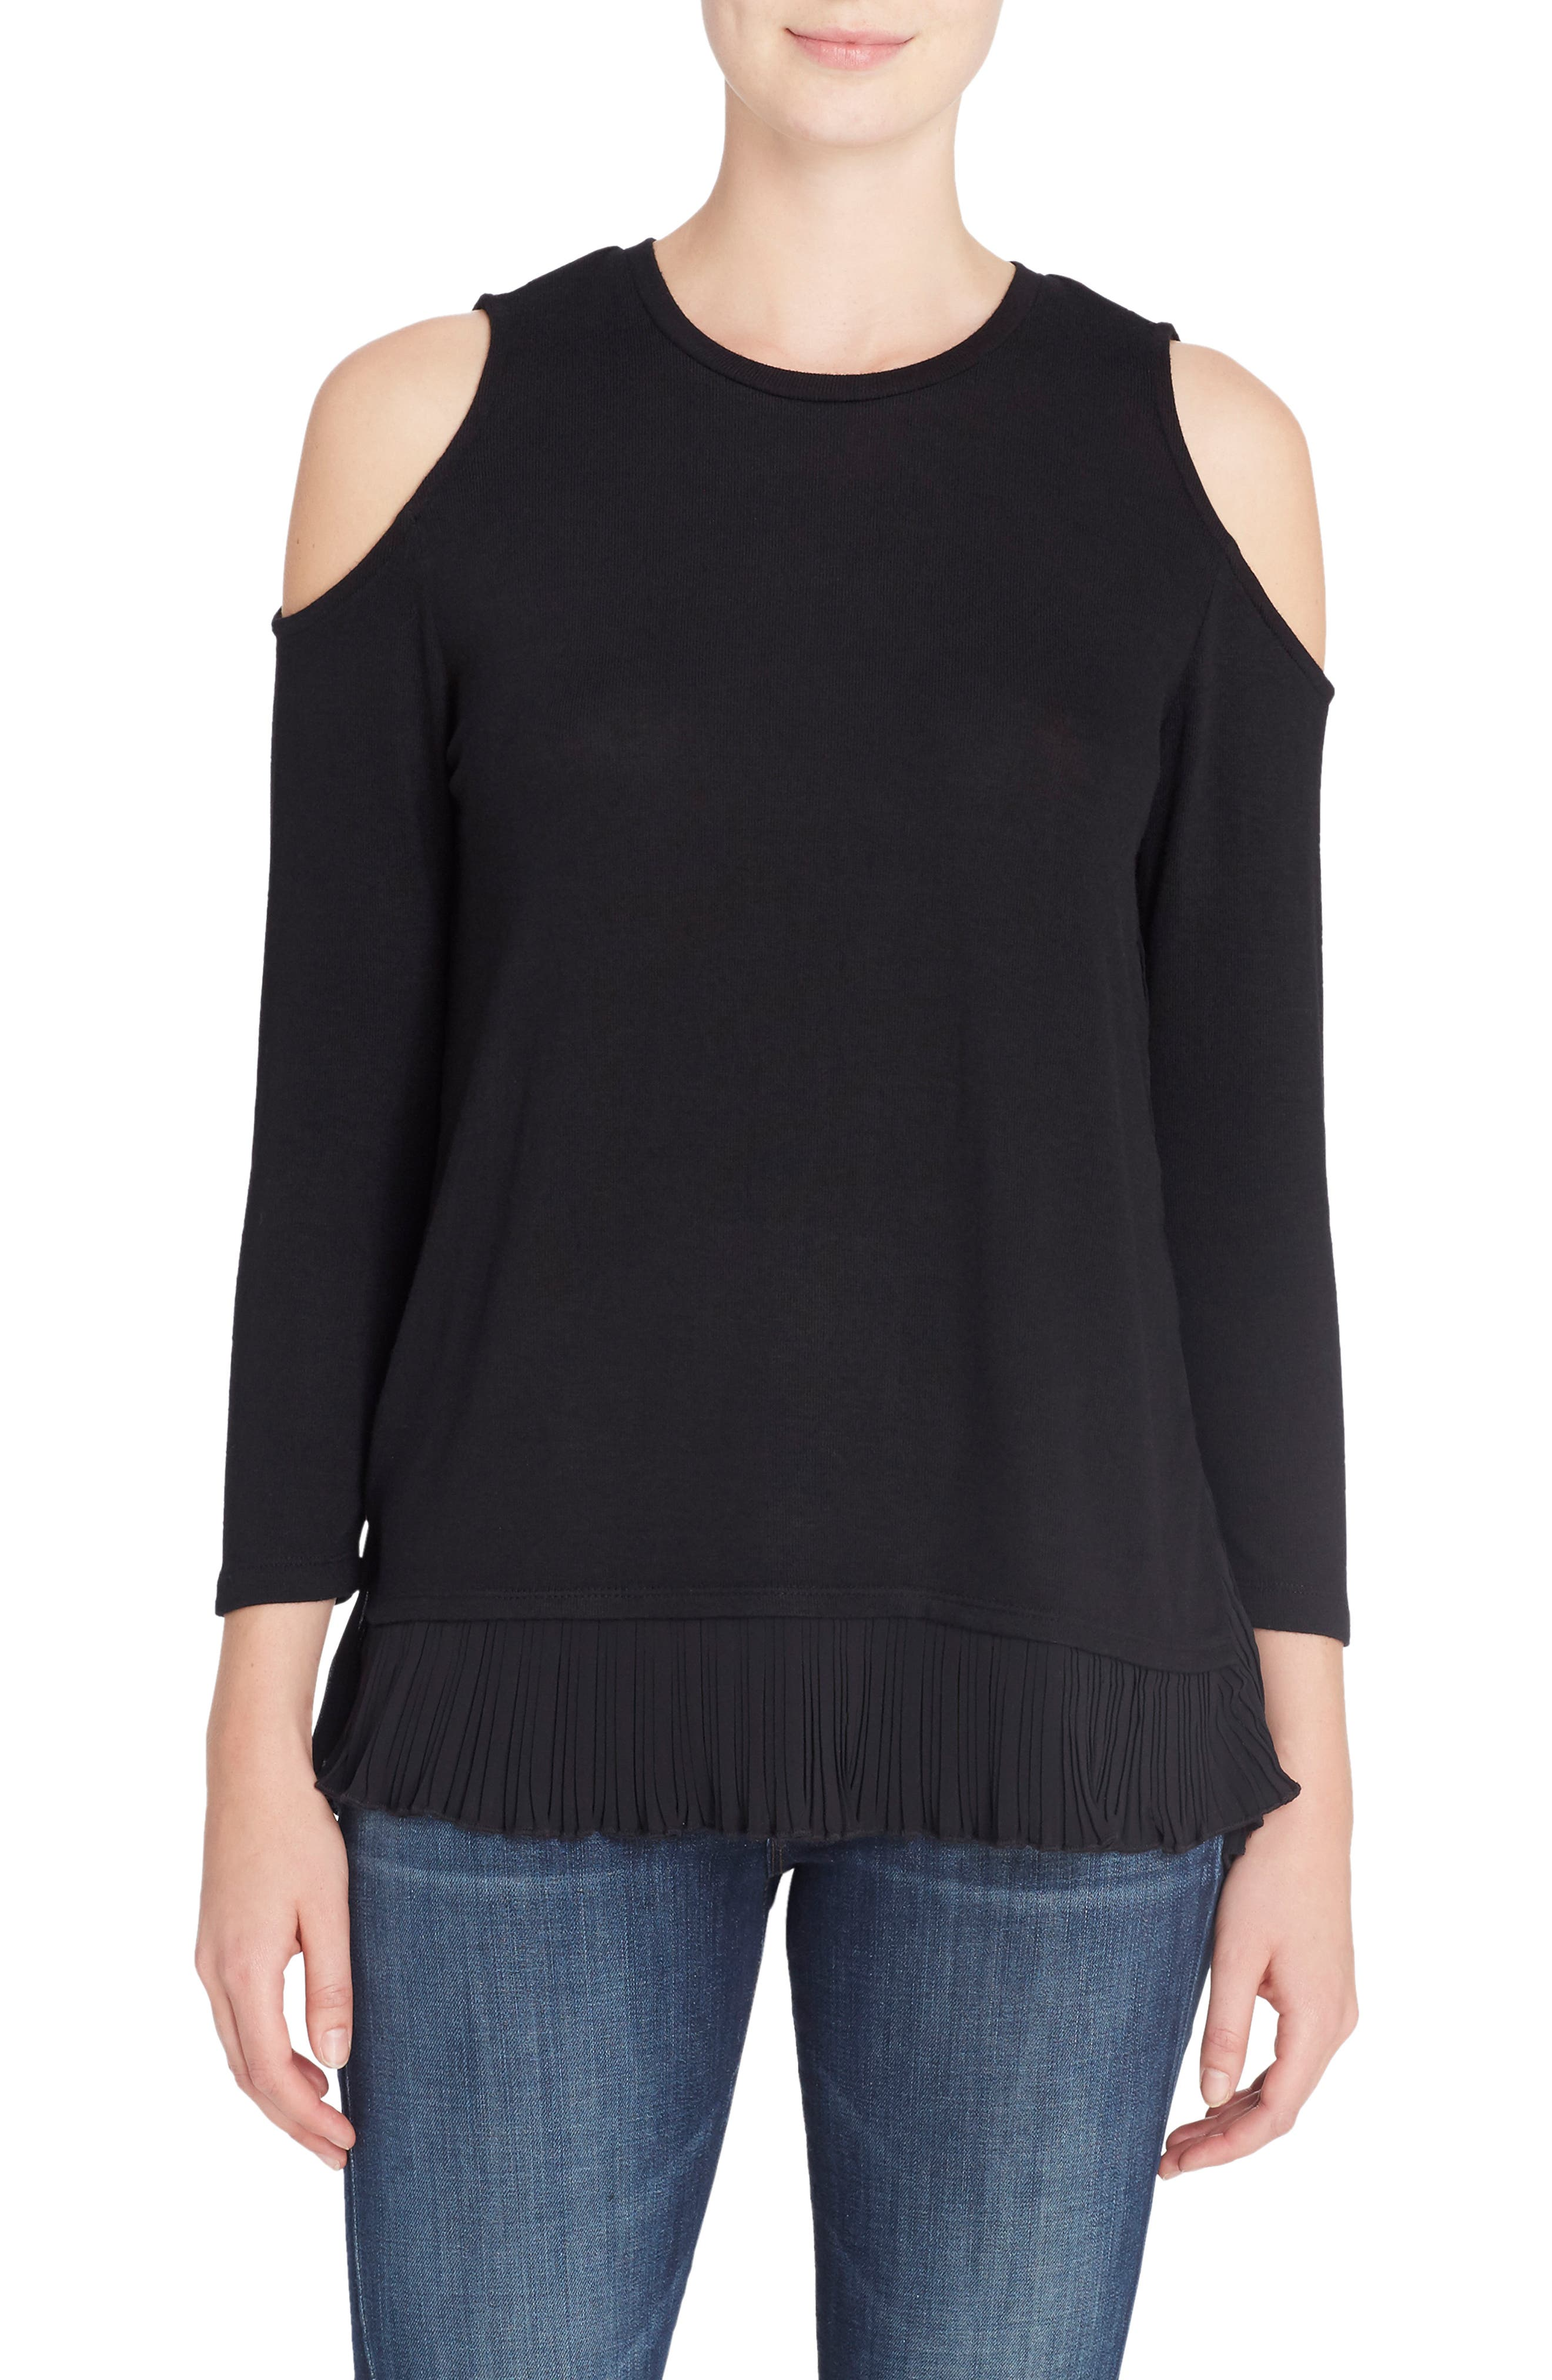 Linda Mixed Media Cold Shoulder Sweater,                             Main thumbnail 1, color,                             Black Beauty